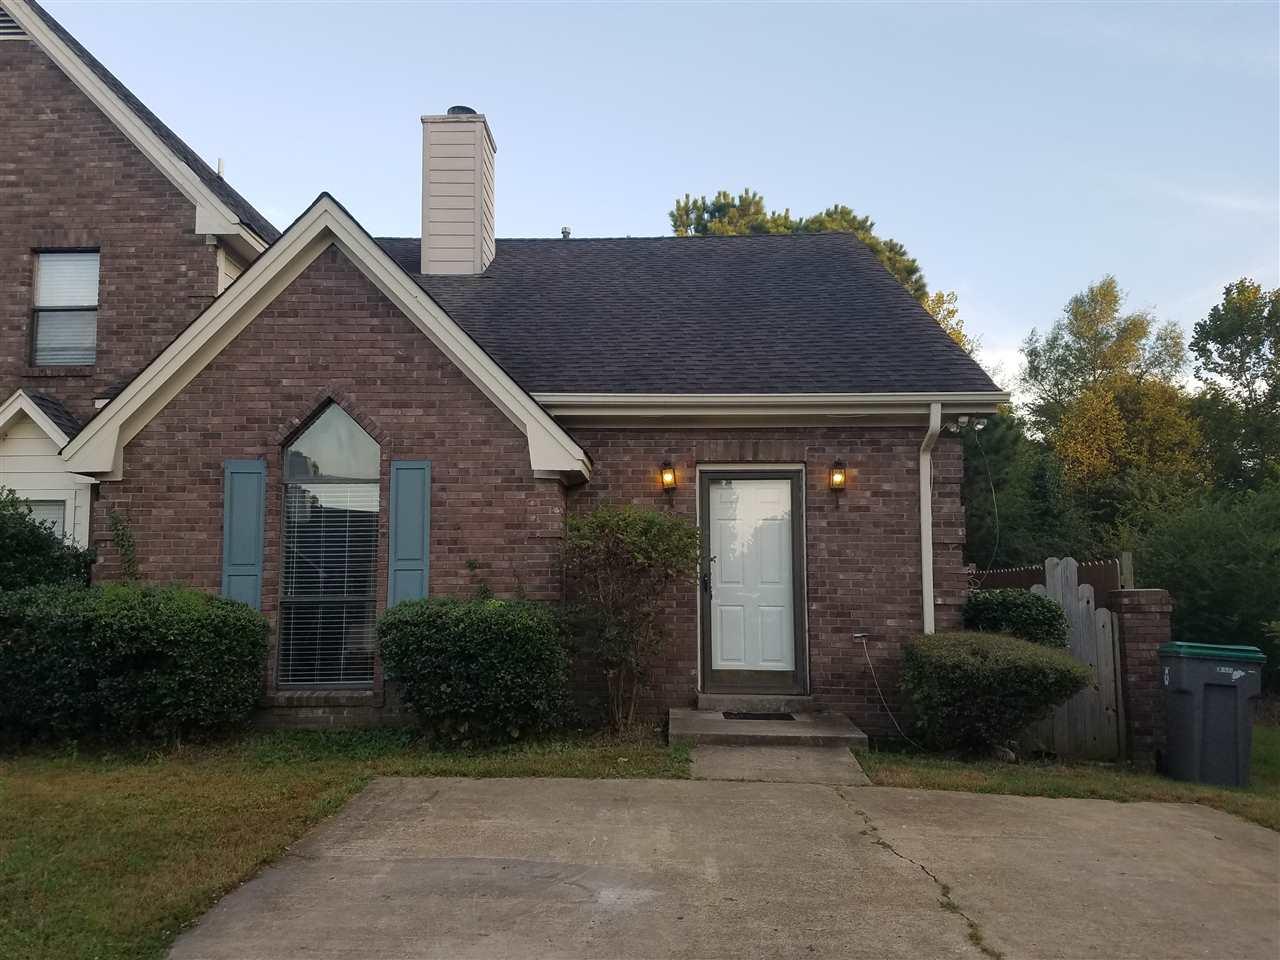 3082 The Willows, Memphis, TN 38119